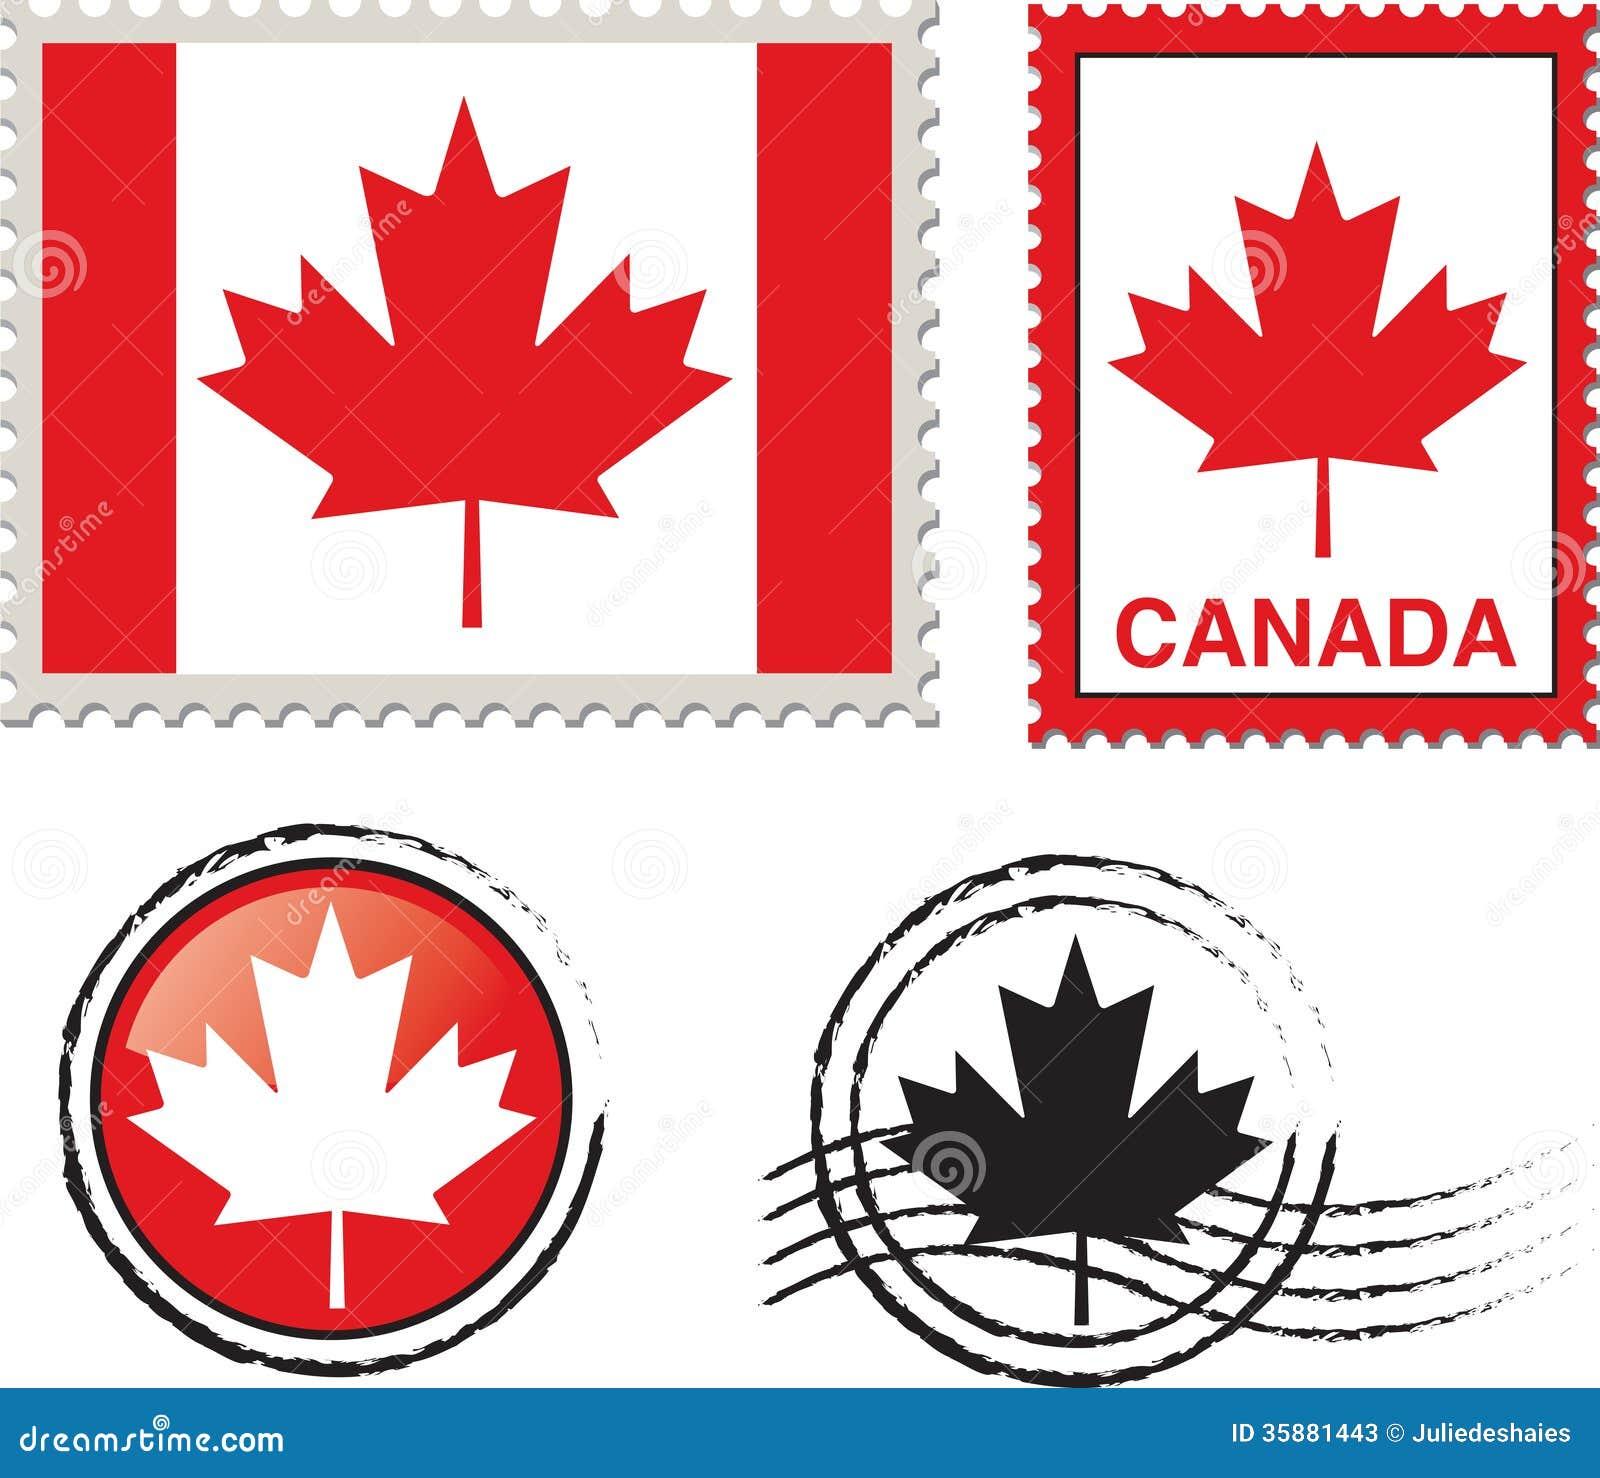 Canada Flag Stamp Stock Photos - Image: 35881443